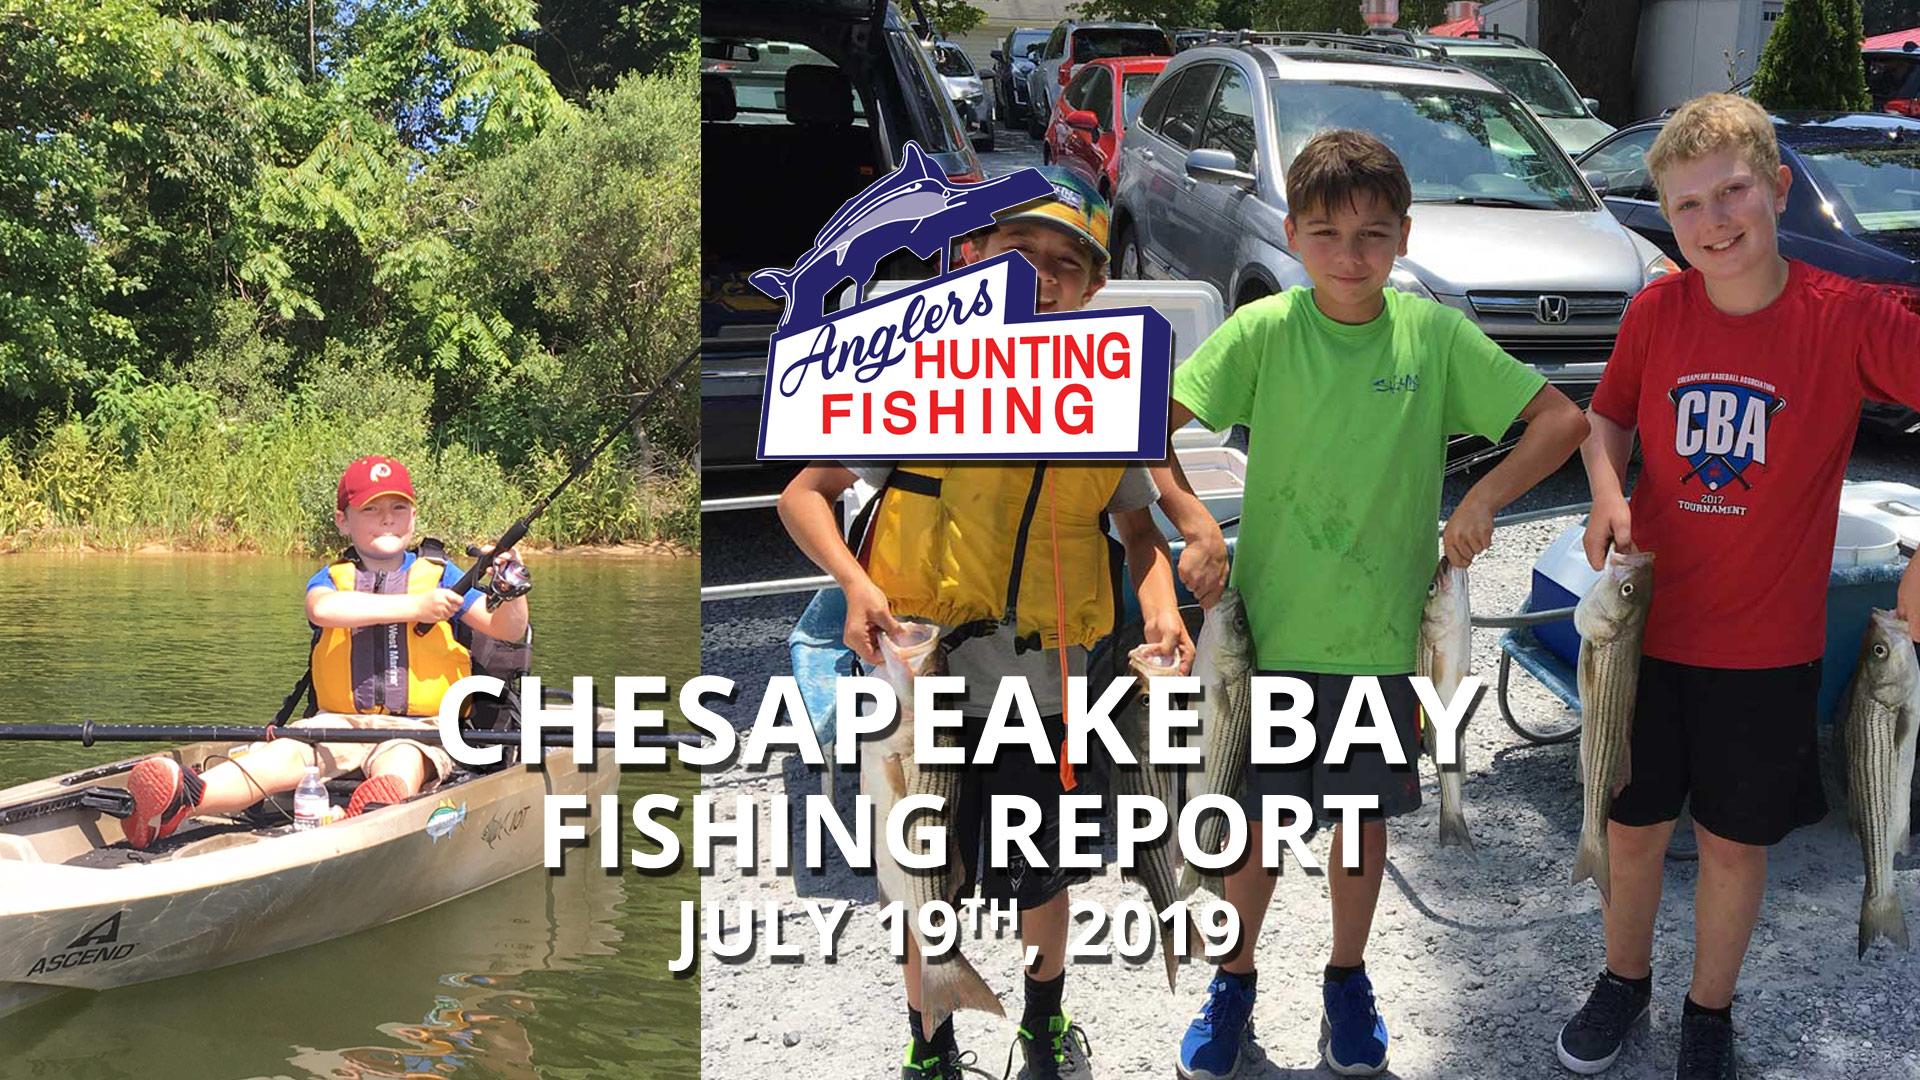 Chesapeake Bay Fishing Report - July 19th, 2019